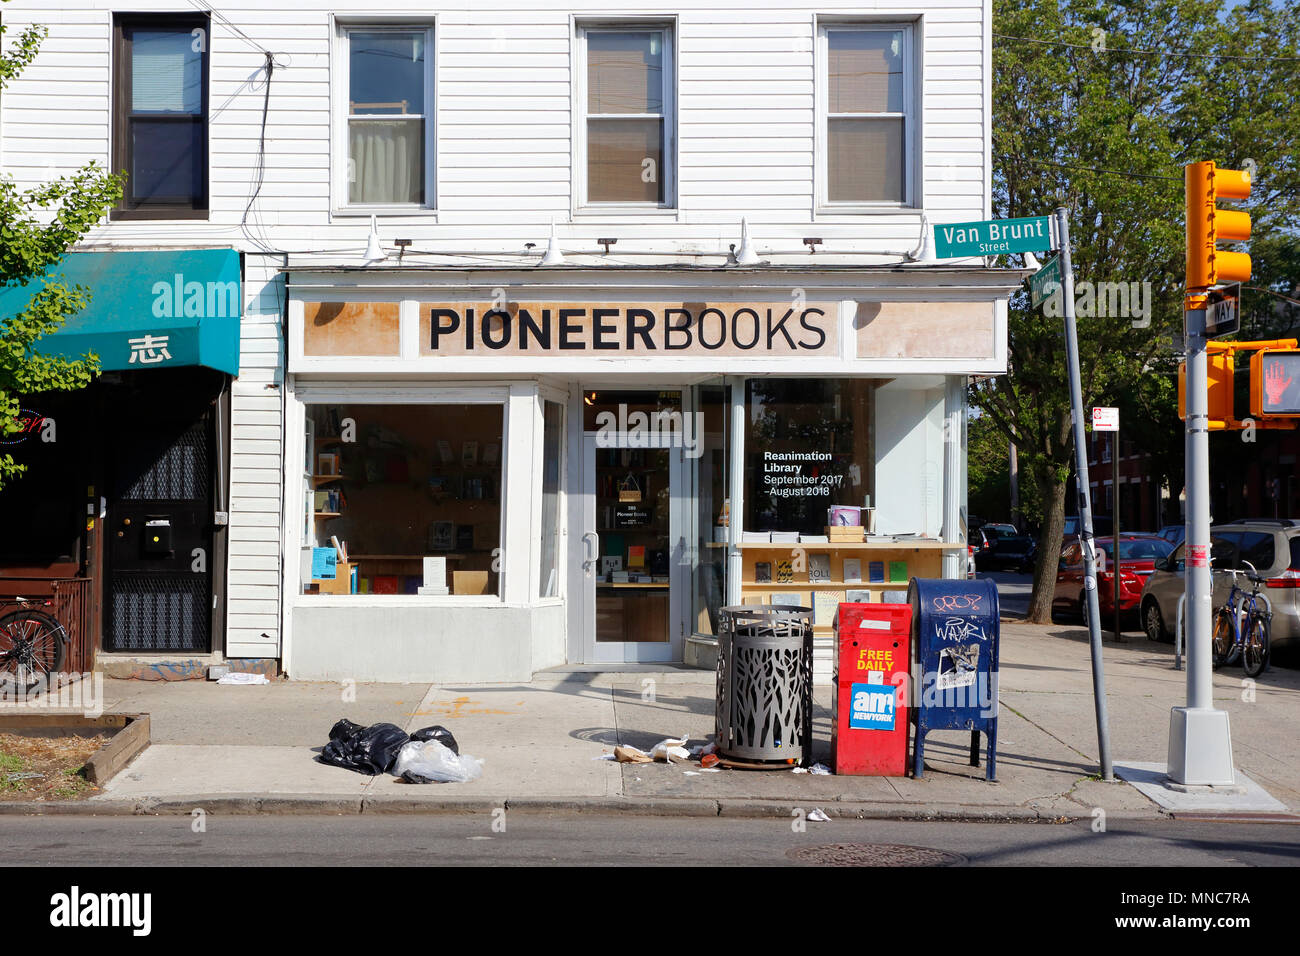 Pioneer Books, 289 Van Brunt St, Brooklyn, NY - Stock Image